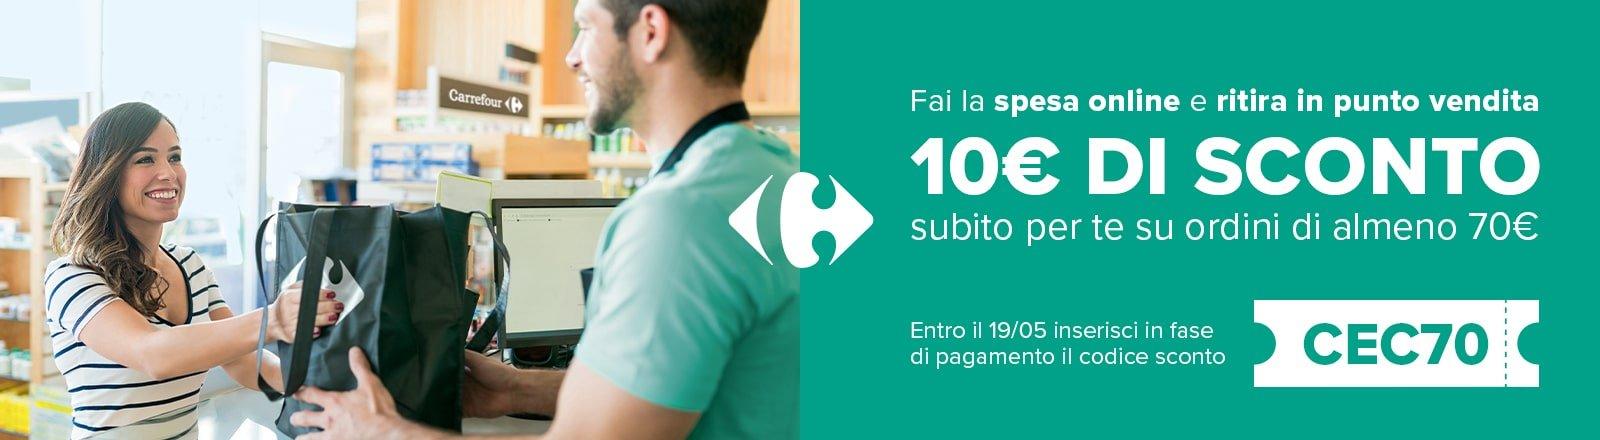 Carrefour: Codice sconto di 10€ per una spesa minima di 70€